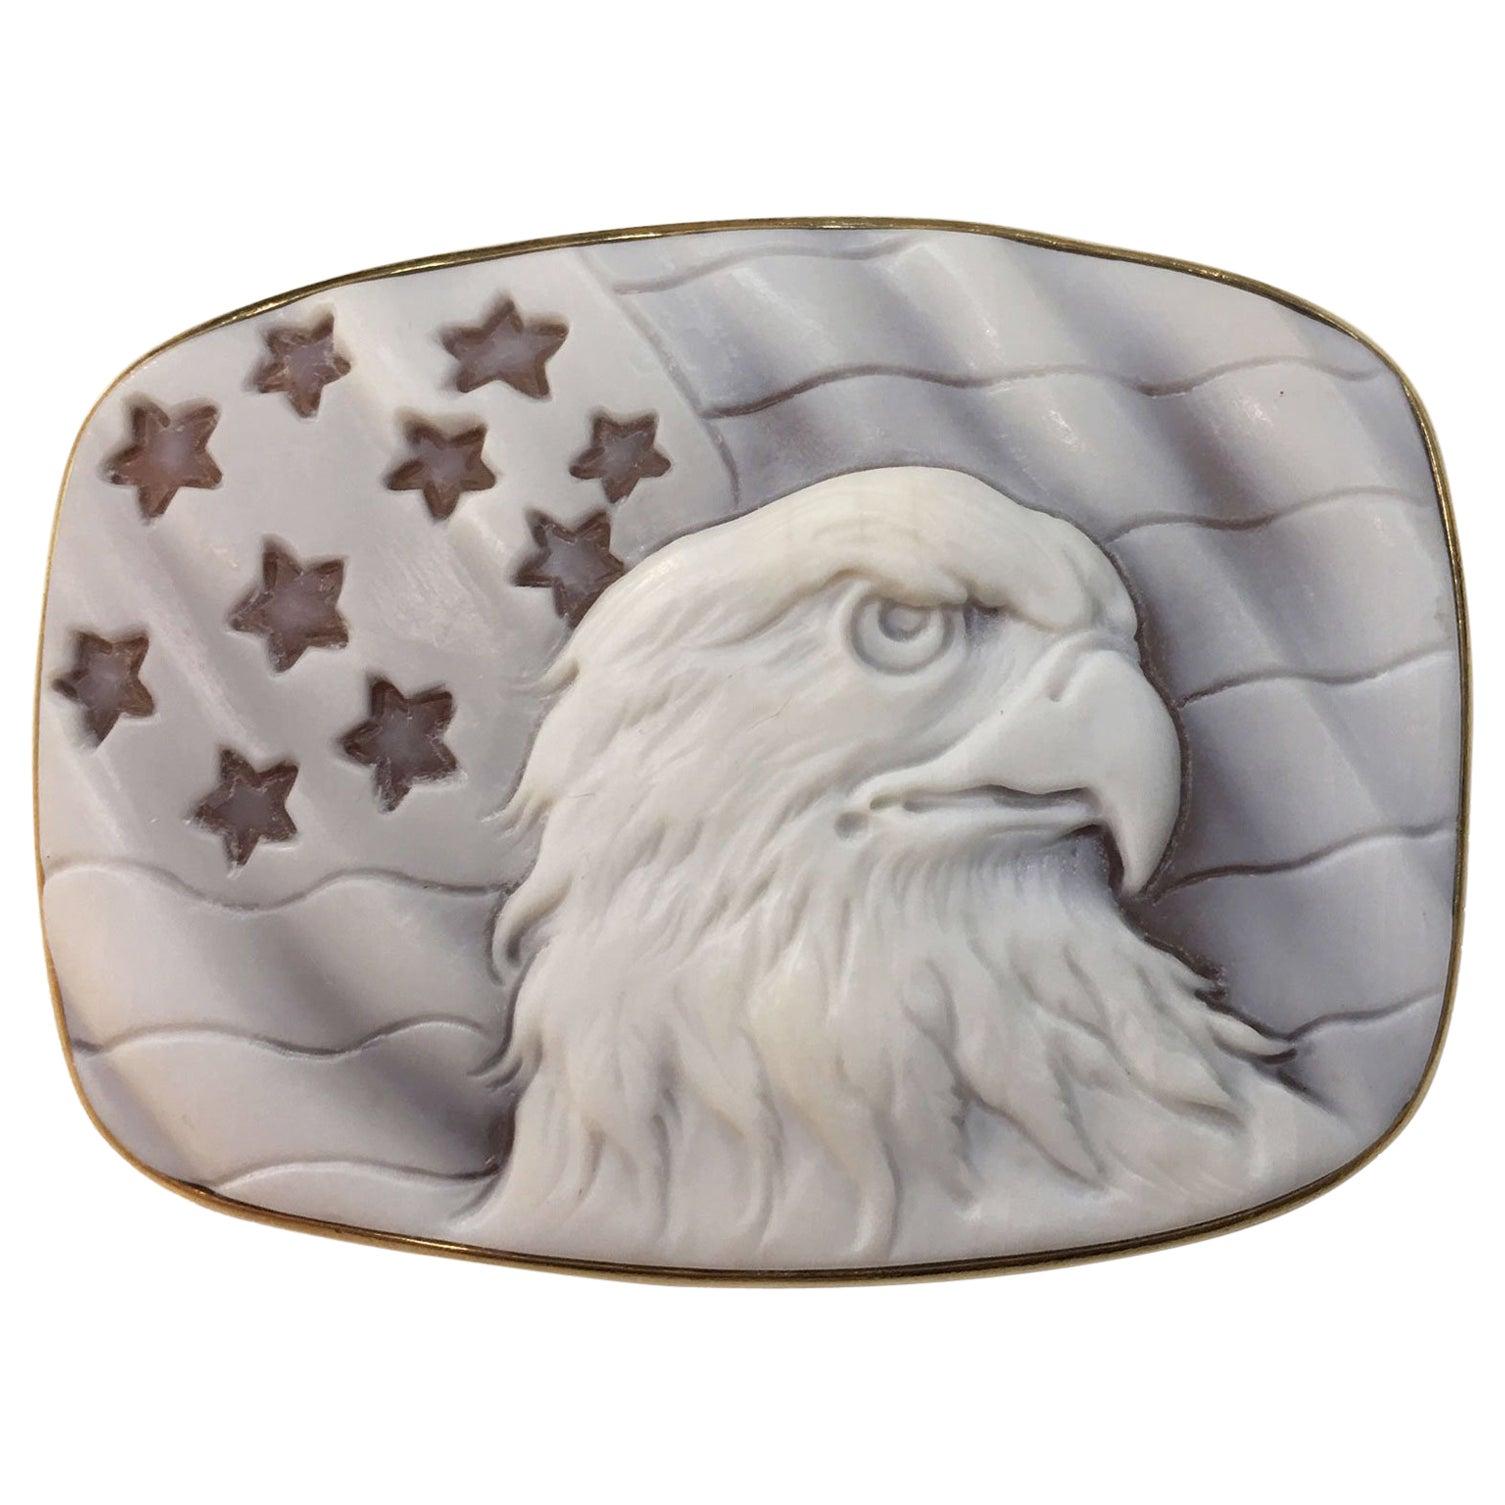 Large American Eagle Cameo Heirloom Pin Brooch Pendant Estate Fine Jewelry